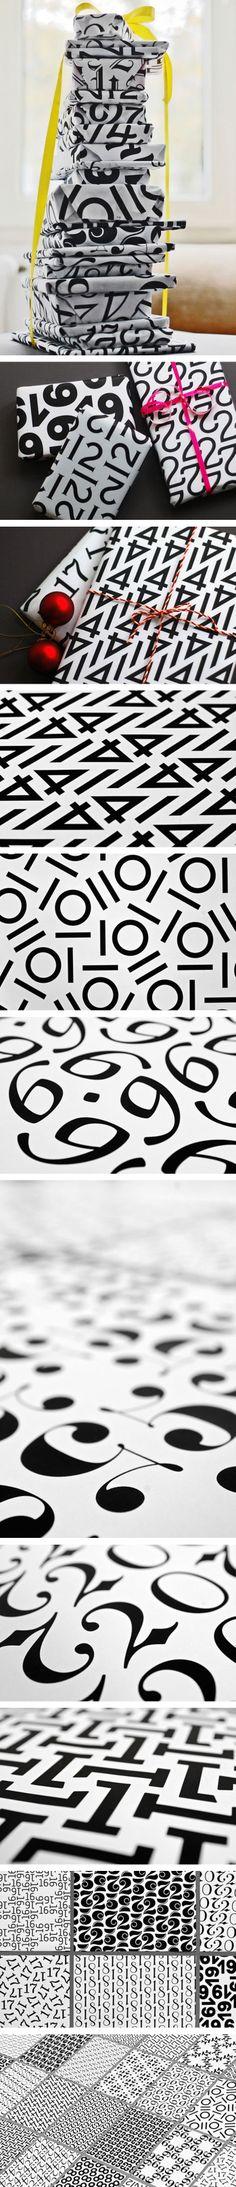 Typographic Gift Wrap by Angelo Stitz,